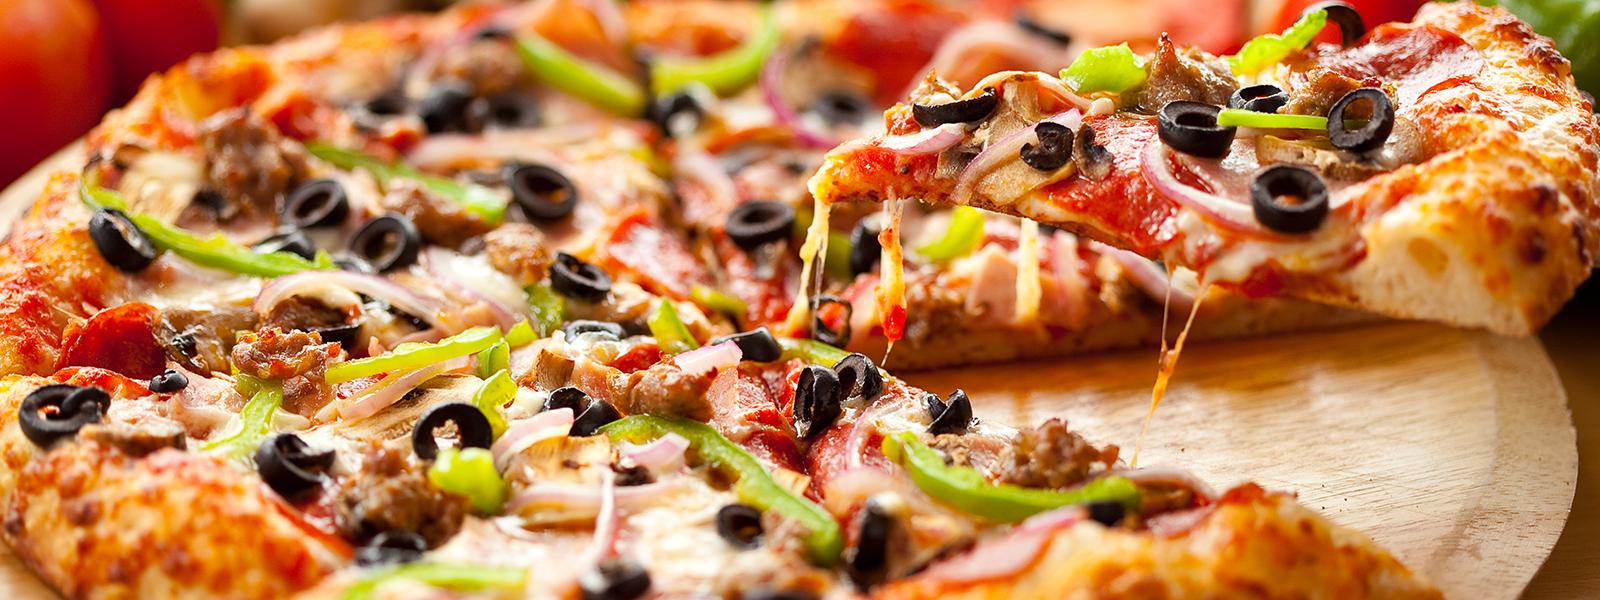 Ugo Pizza Ugo Pizza Gildersome Takeaway Order Online